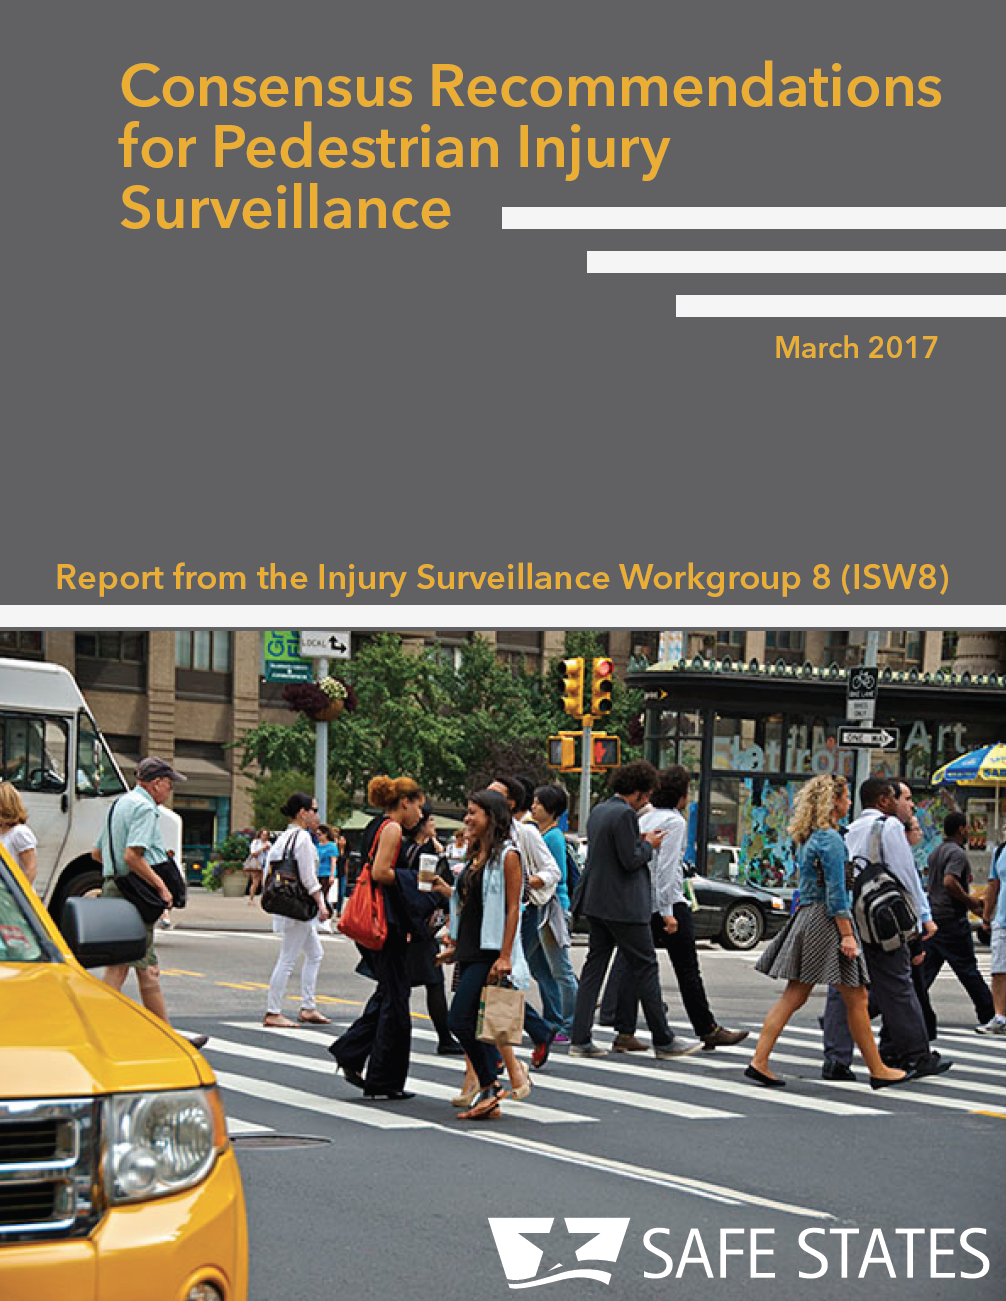 Consensus Recommendations for Pedestrian Injury Surveillance